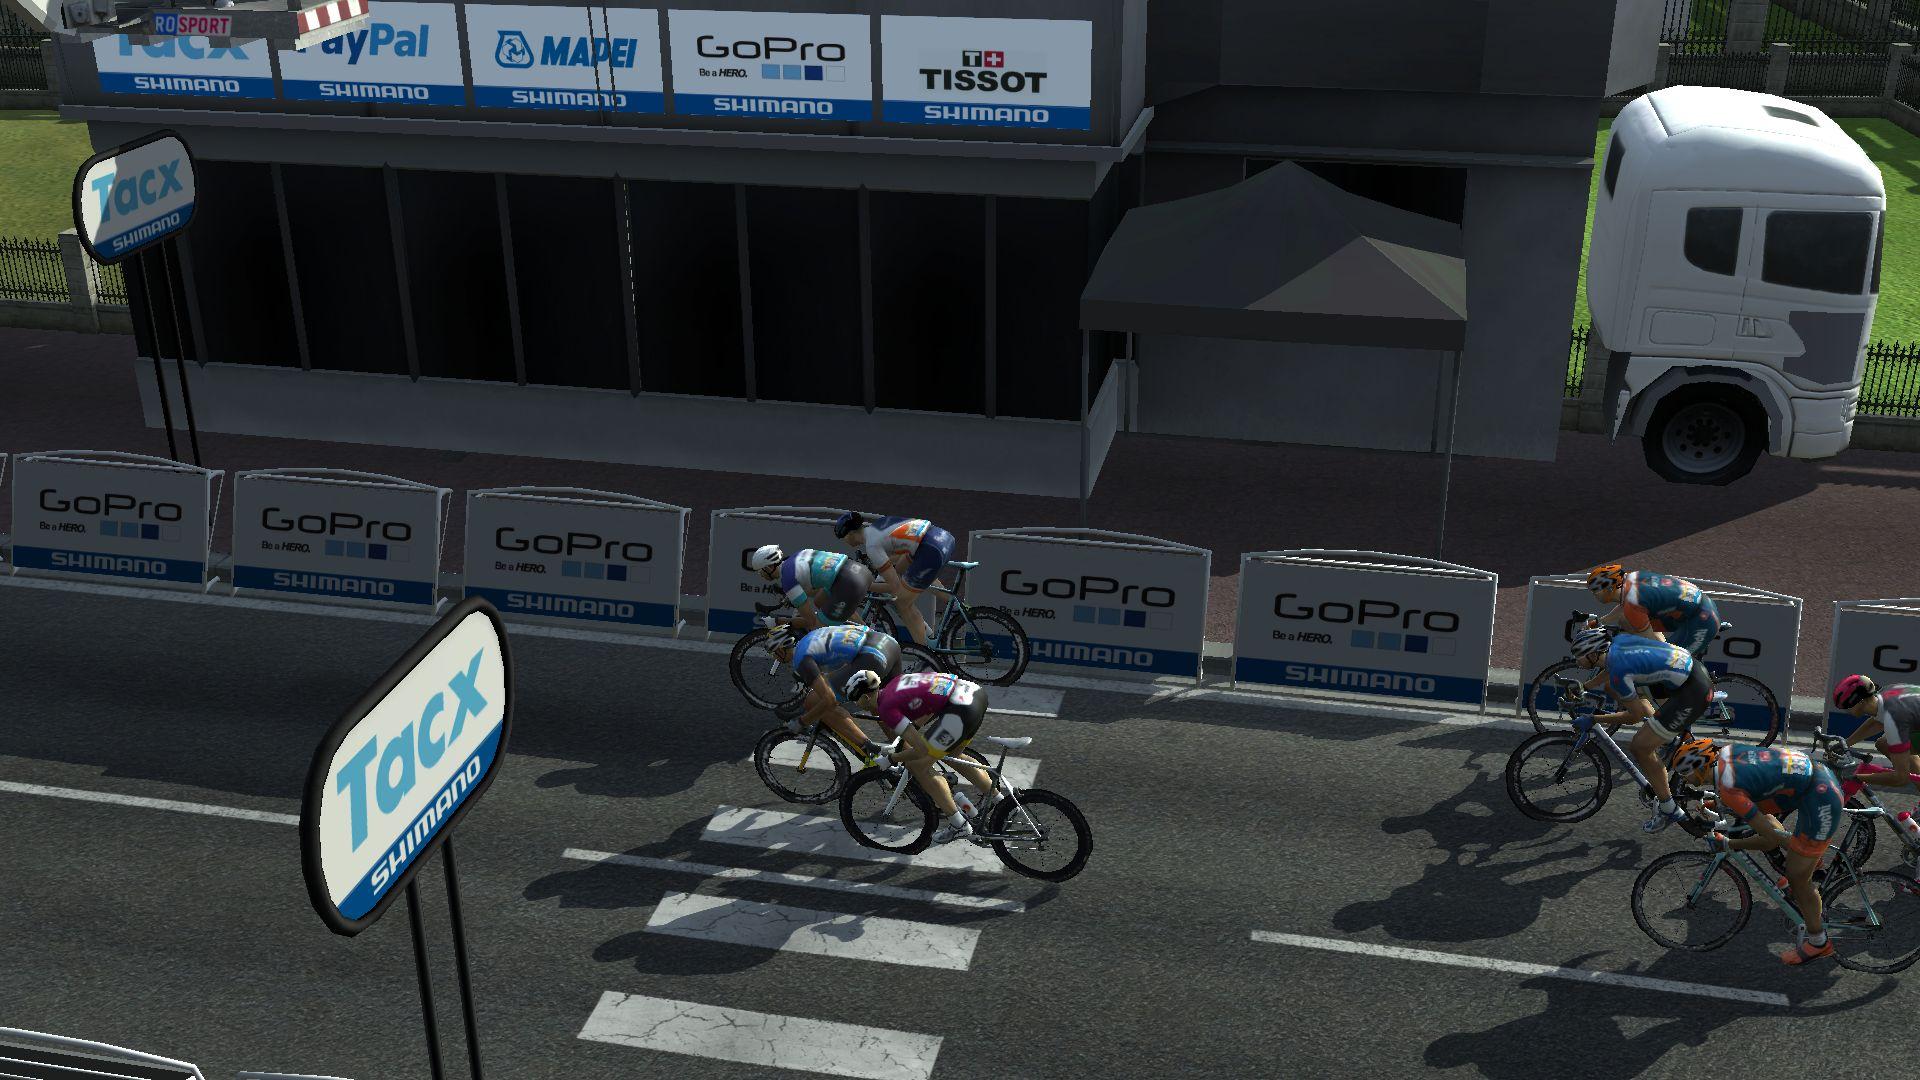 pcmdaily.com/images/mg/2018/Races/GTM/Giro/mg18_giro_07_PCM0101.jpg